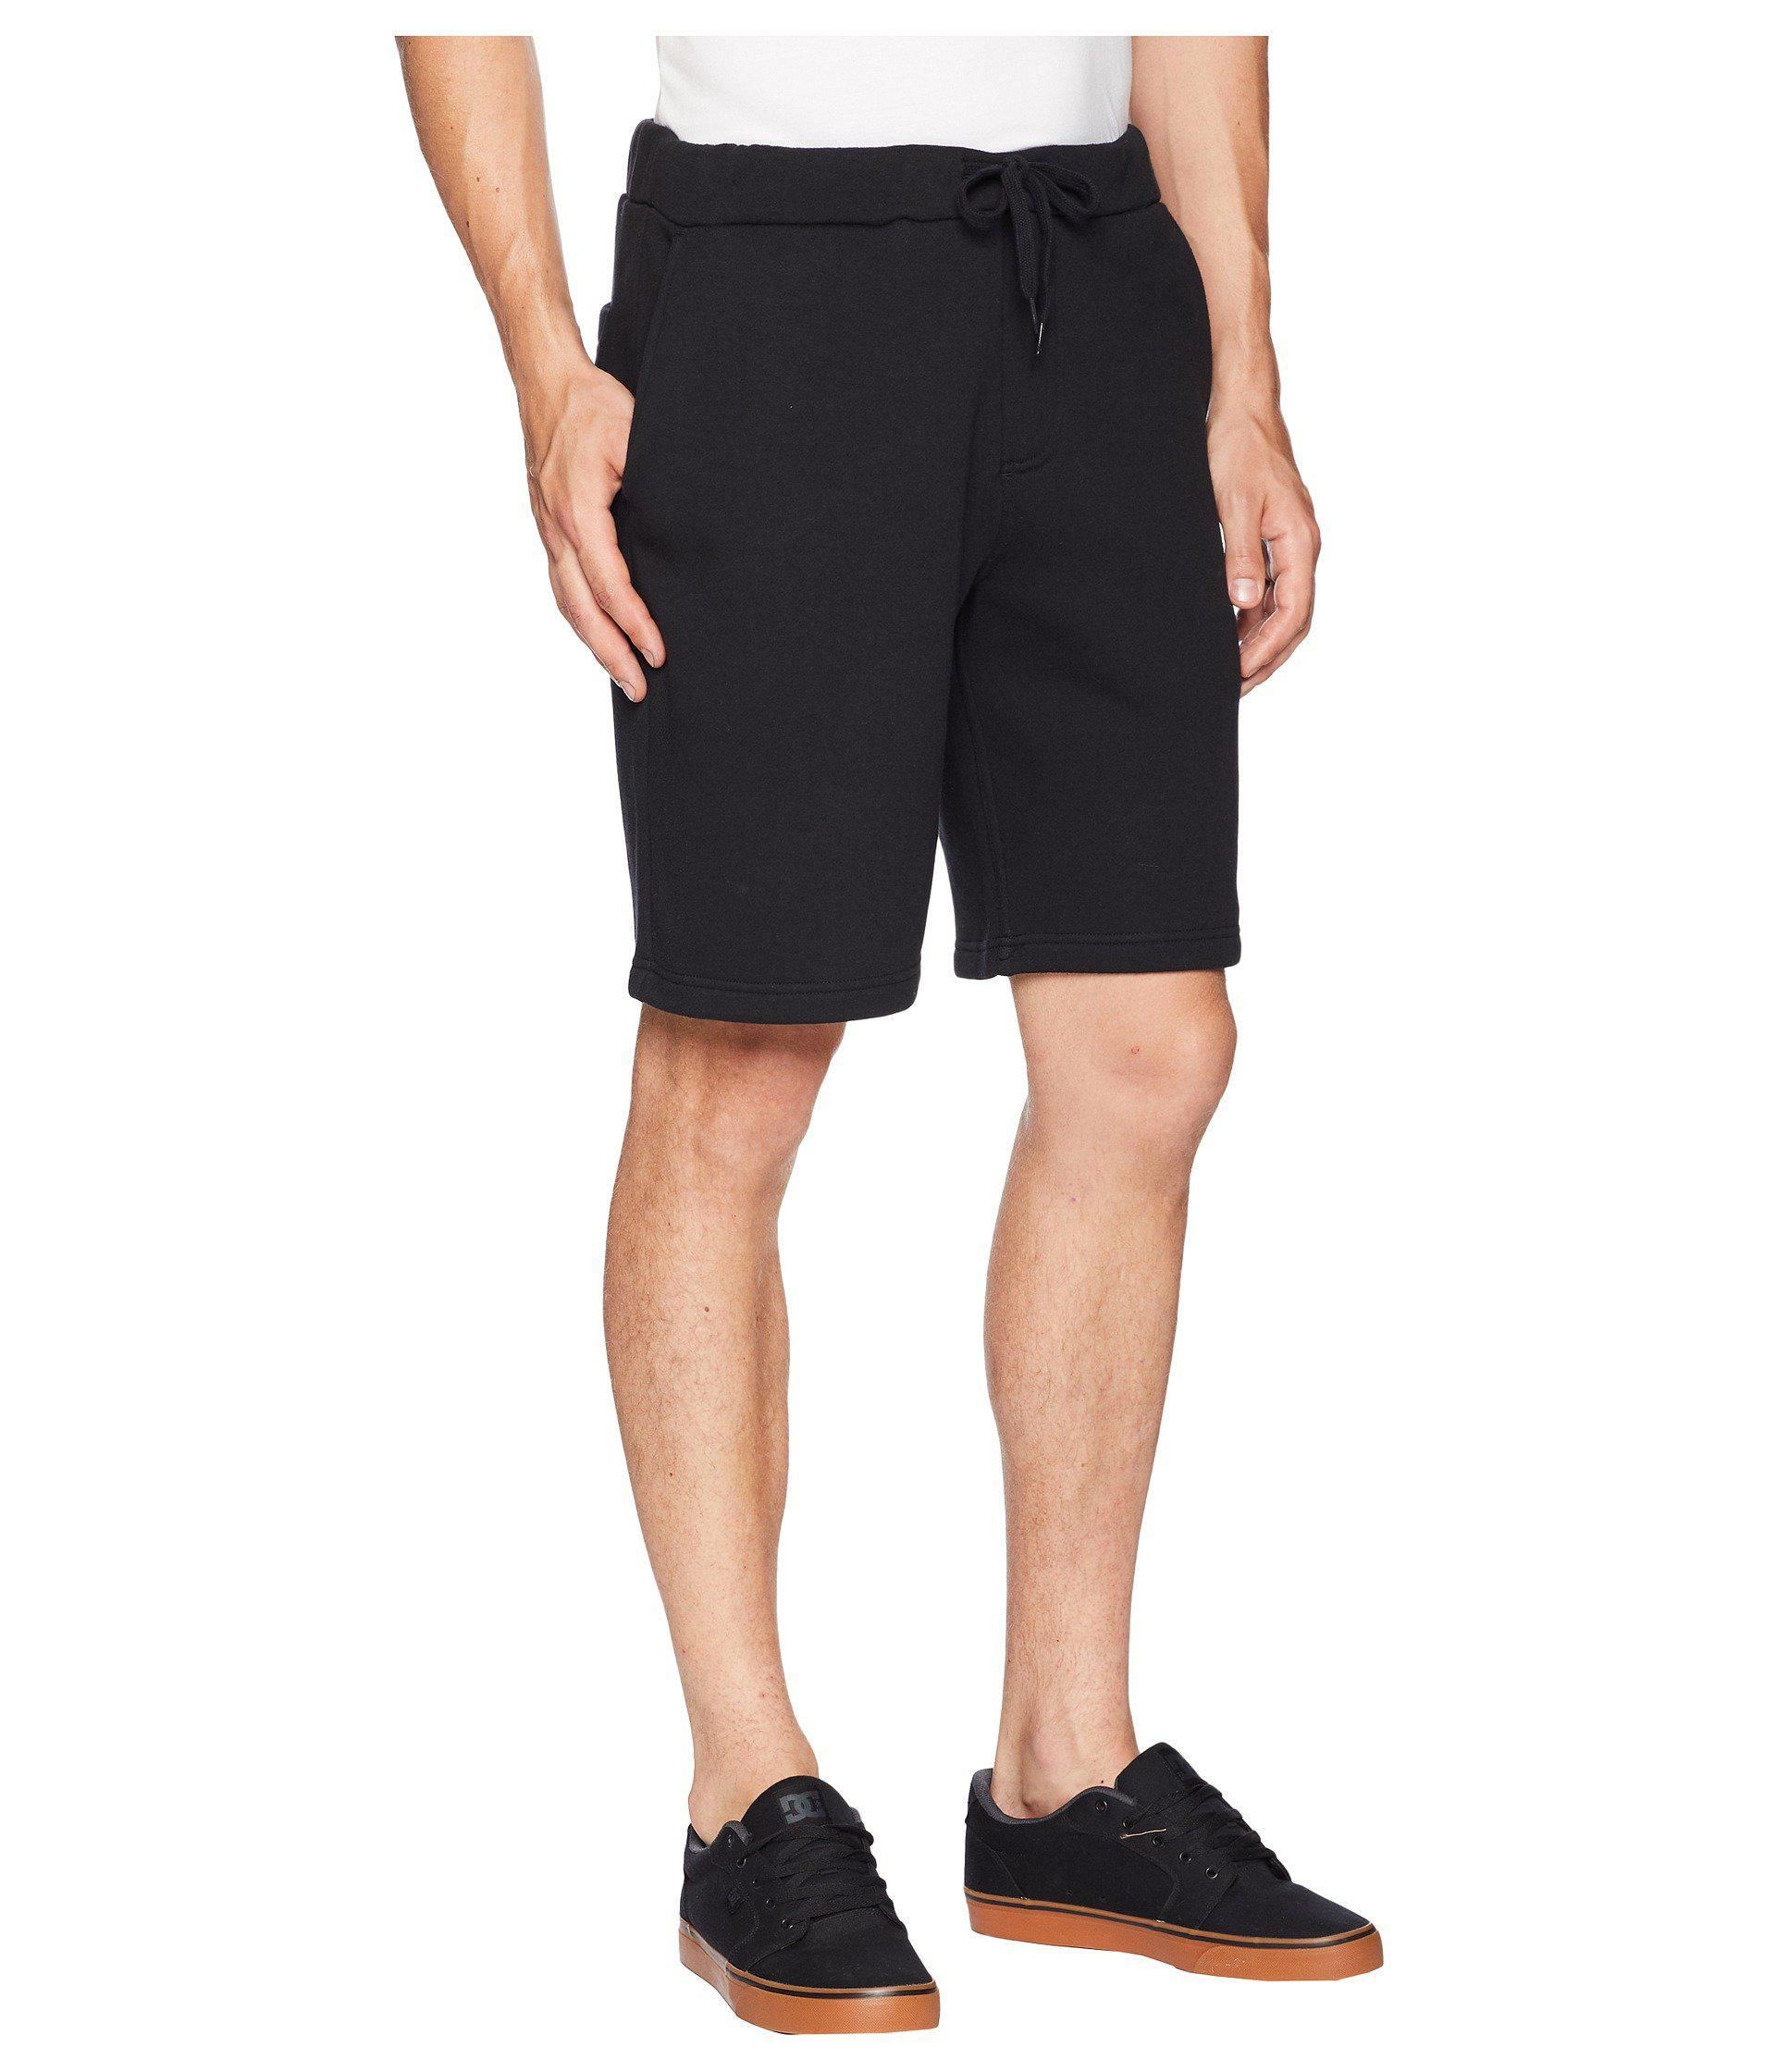 043d369f65 Lyst - Vans Blendline Fleece Shorts (black) Men s Shorts in Black ...